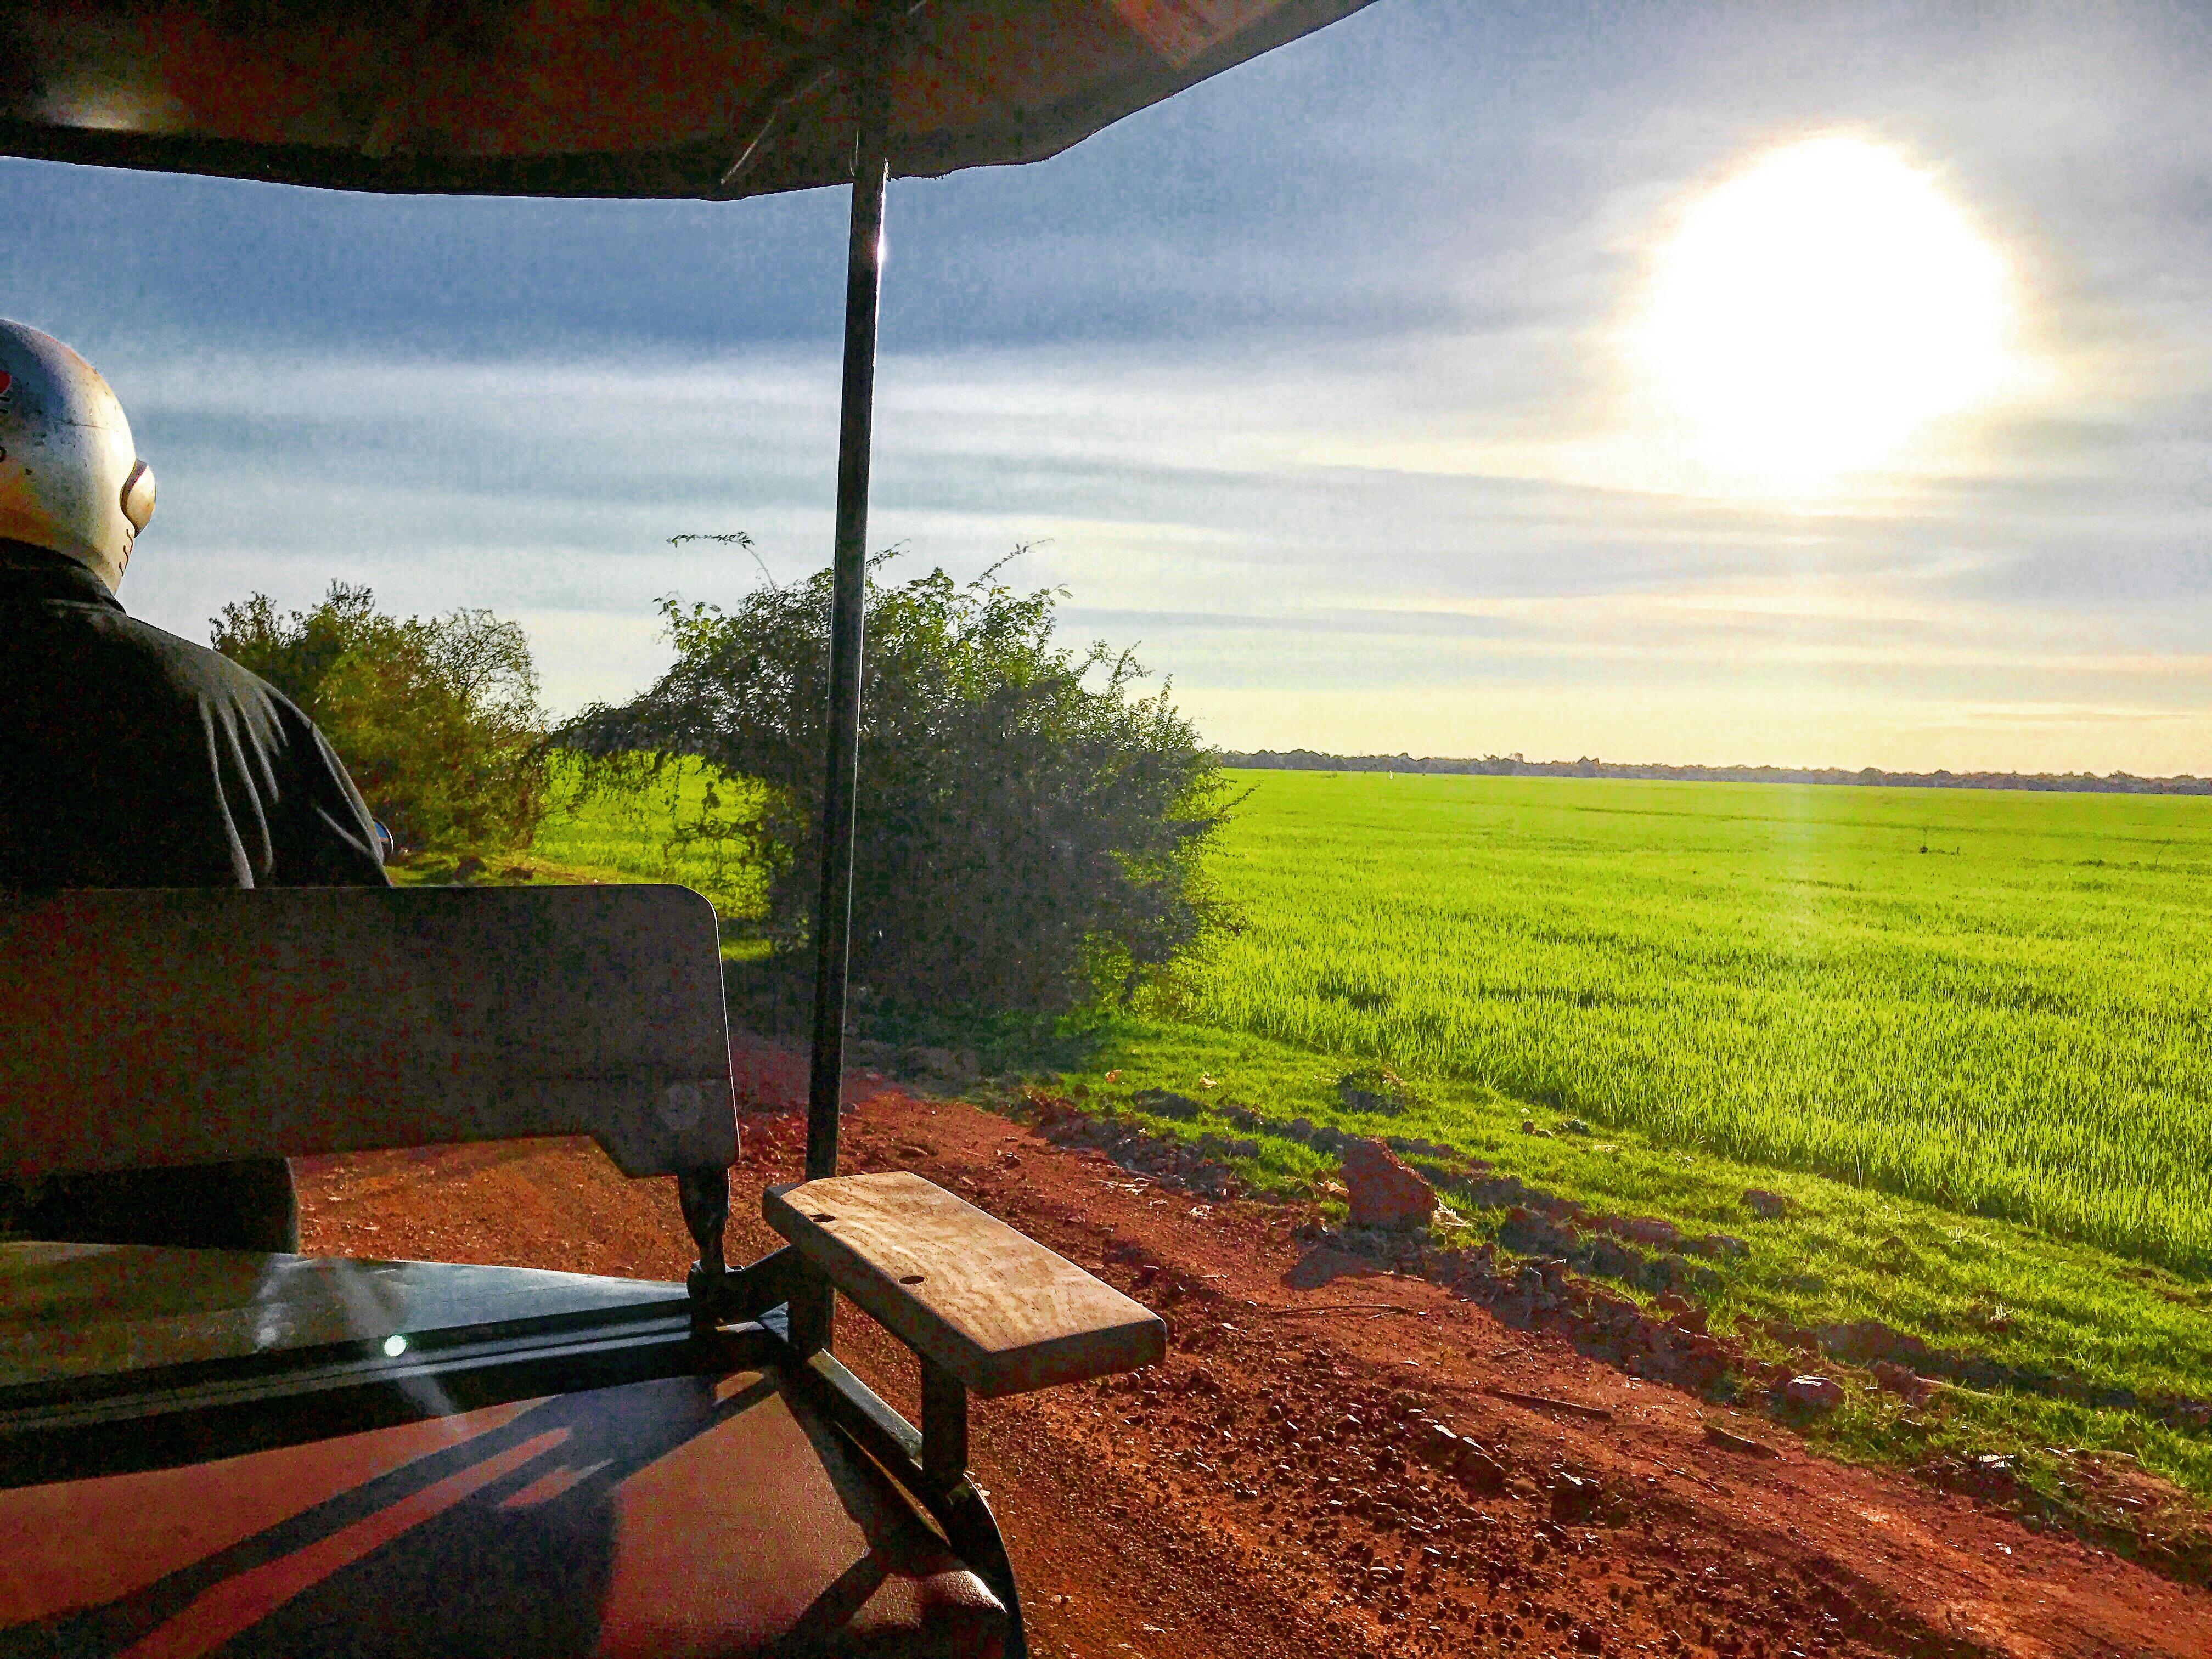 Riding a Tuk Tuk through the Countryside in Siem Reap , Cambodia